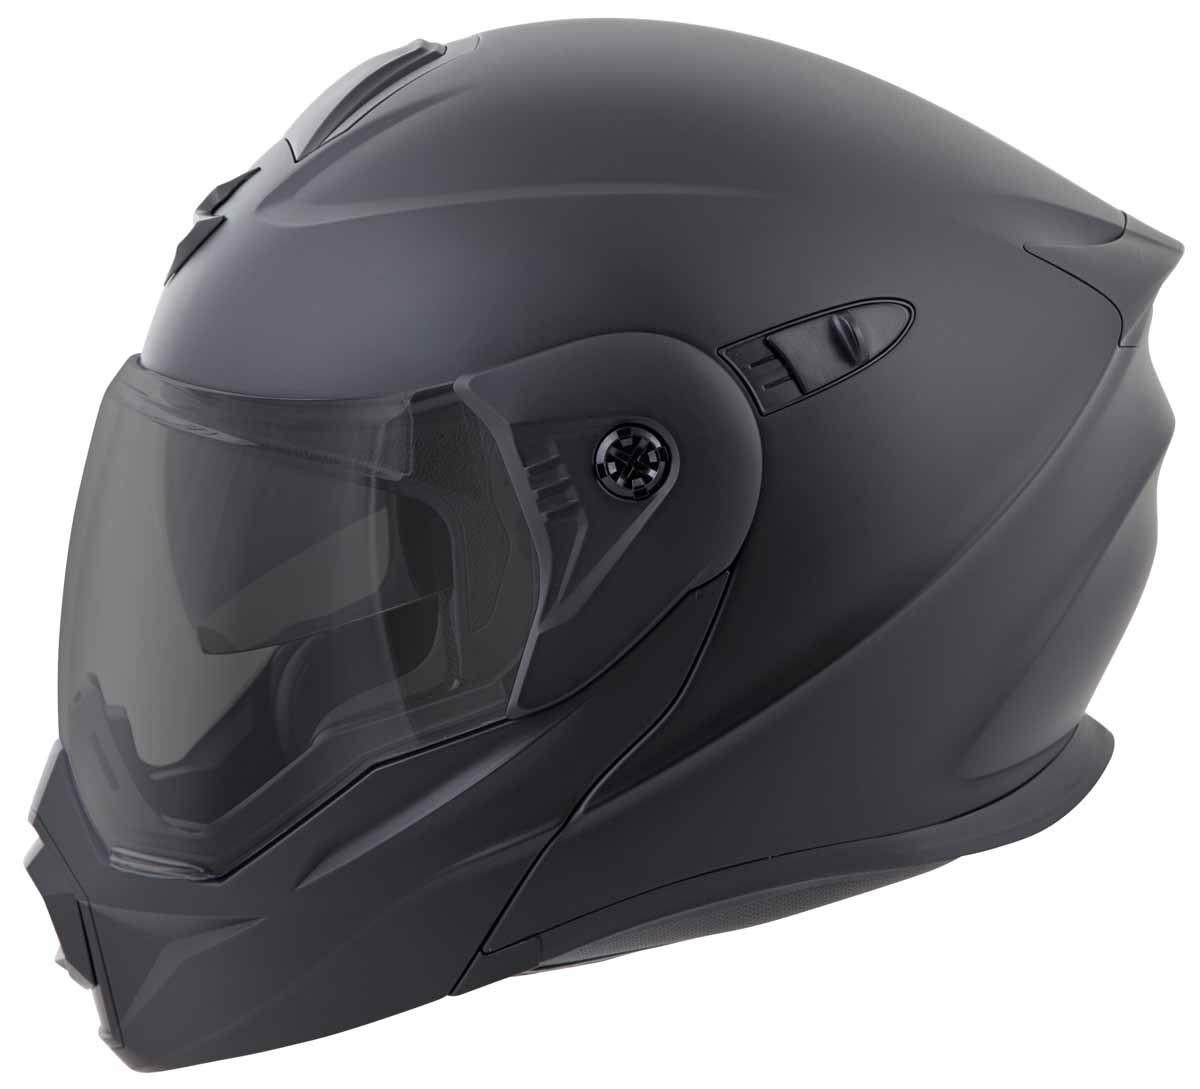 Scorpion-EXO-AT950-Helmet-Flip-Up-Modular-Dual-Sport-Adventure-ADV-DOT-XS-3XL miniature 10